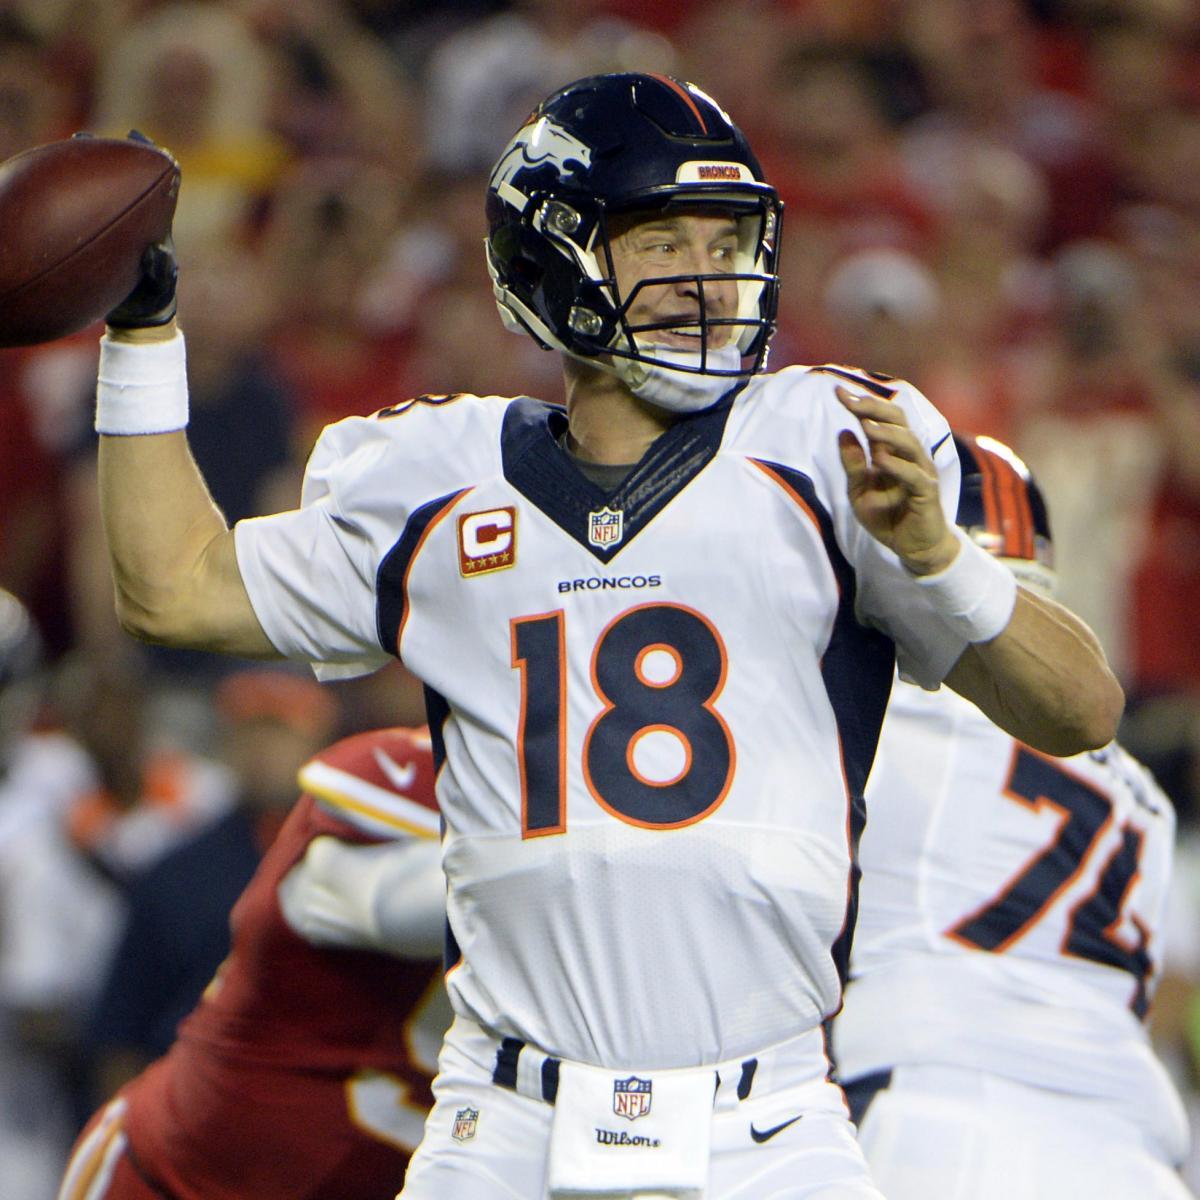 Denver To Hawaii: 5 Biggest Takeaways From Denver Broncos' Week 2 Game Vs